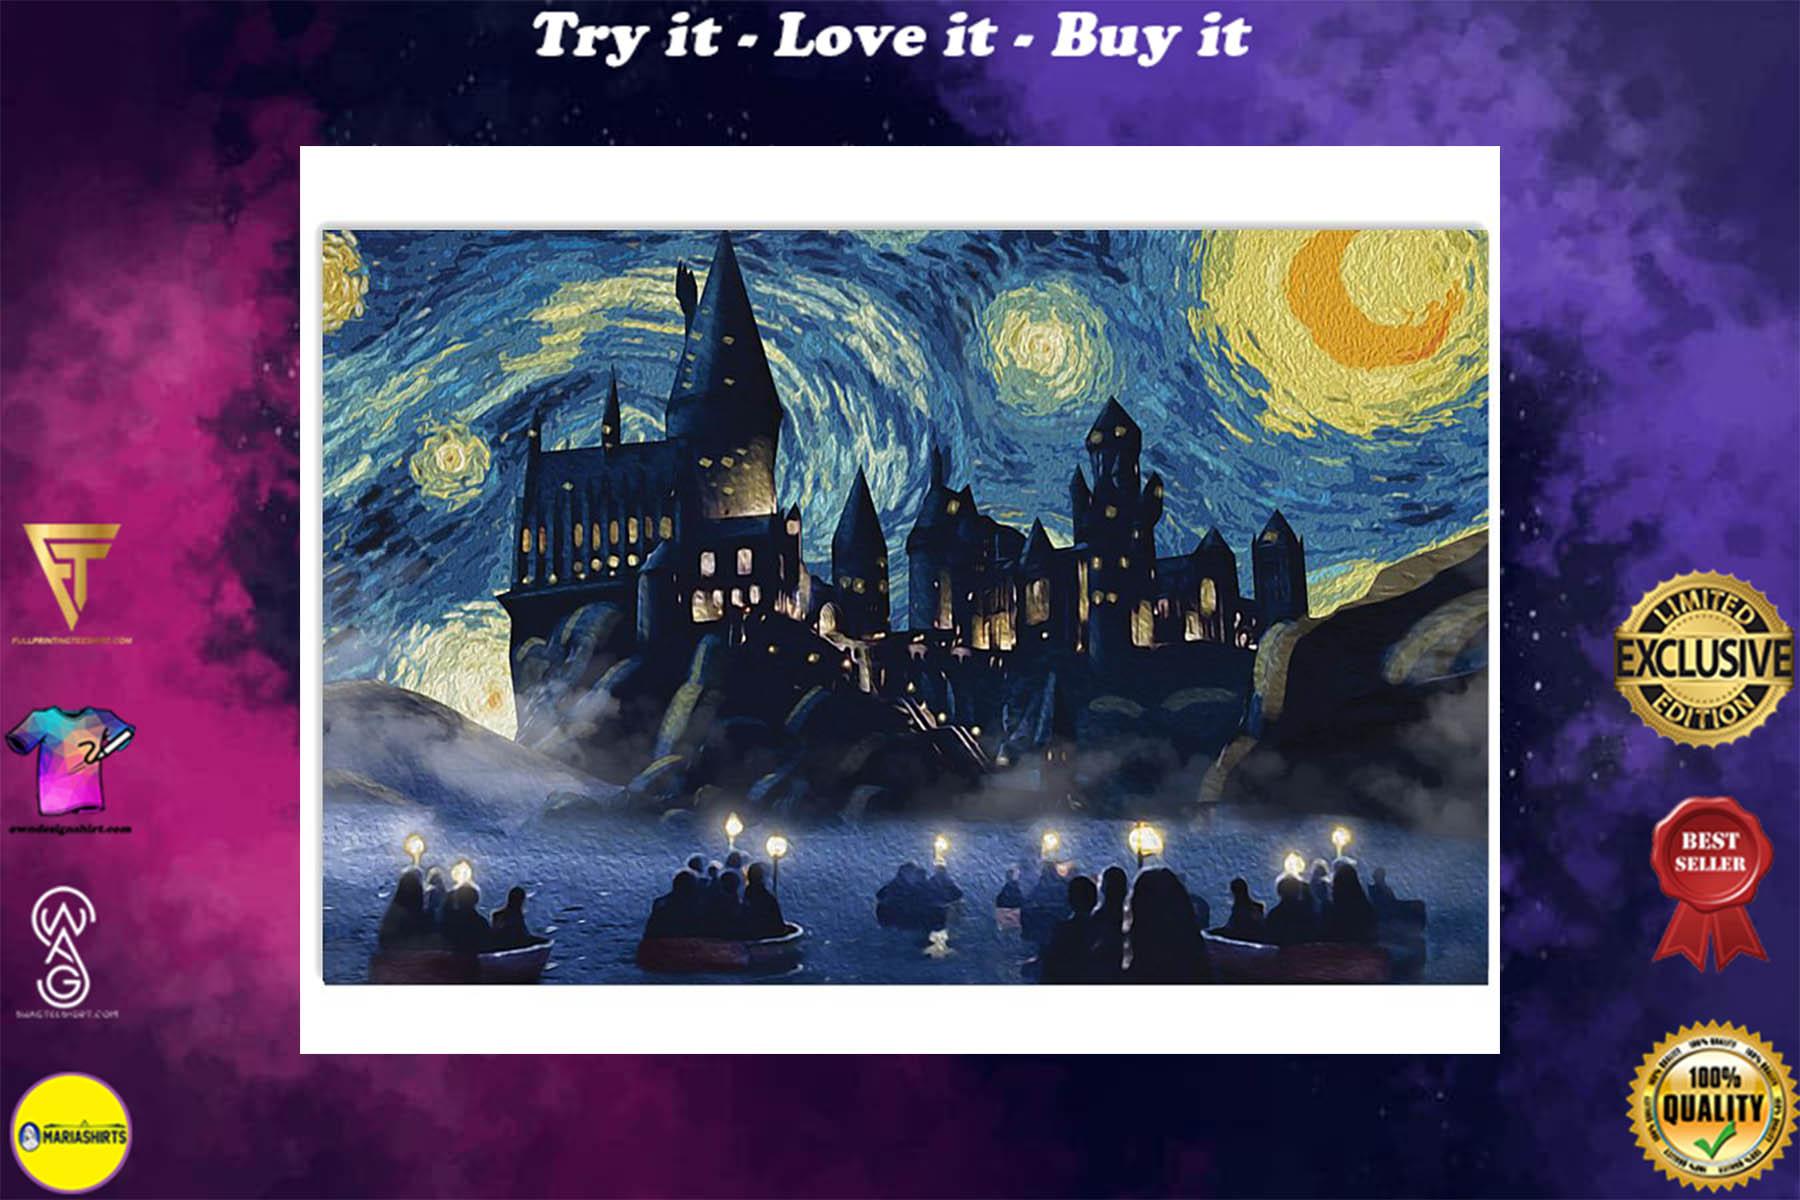 vincent van gogh starry night hogwarts harry potter poster